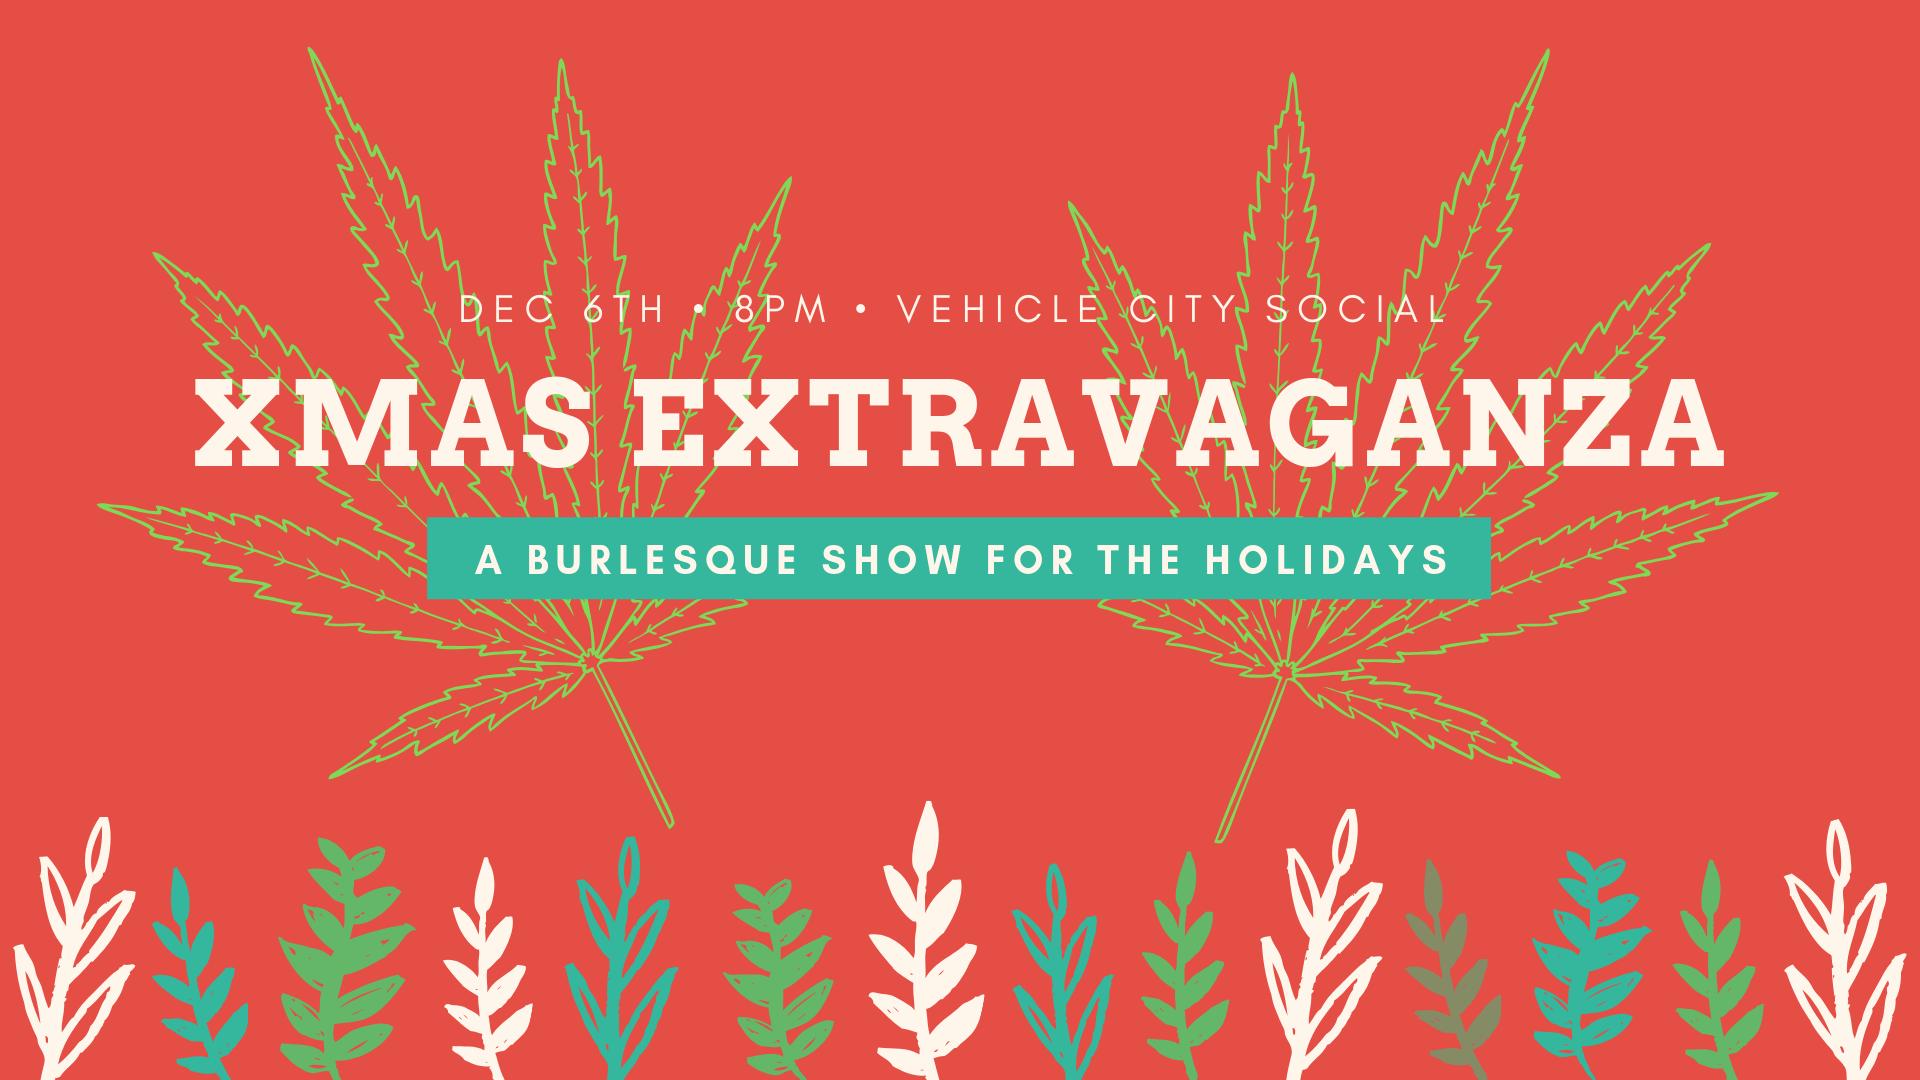 Xmas Extravaganza - A Burlesque Show for the Holidays